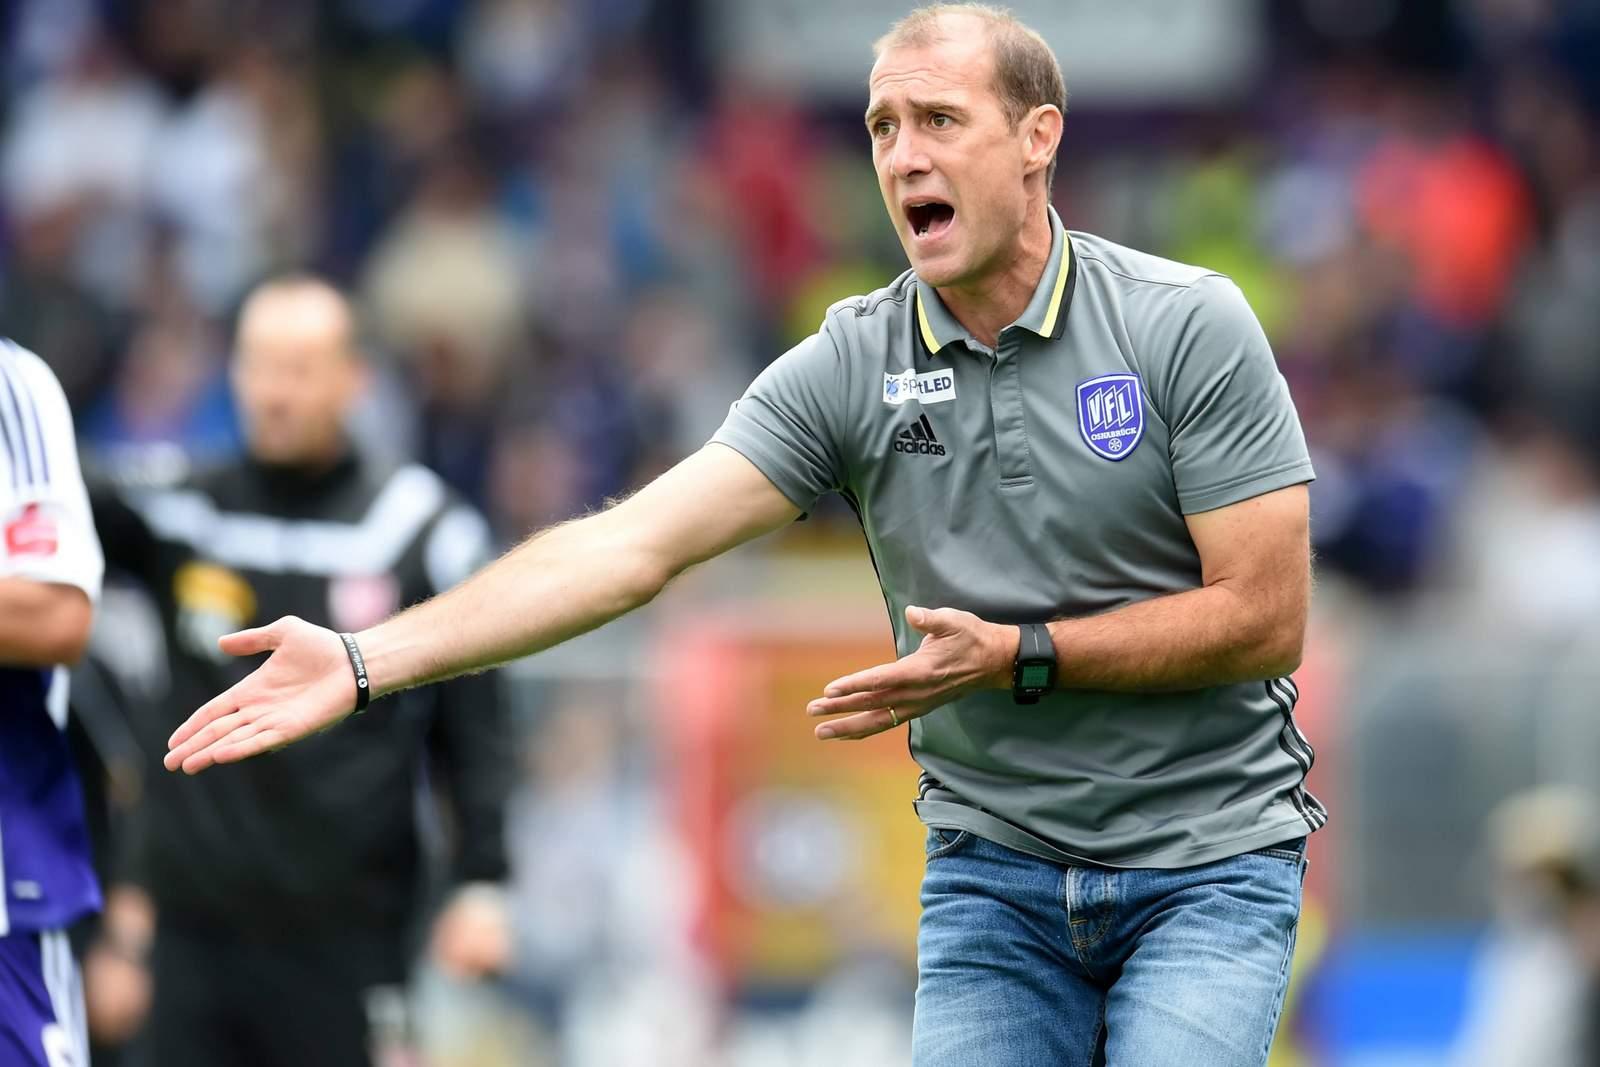 Umstritten: Osnabrücks Trainer Joe Enochs